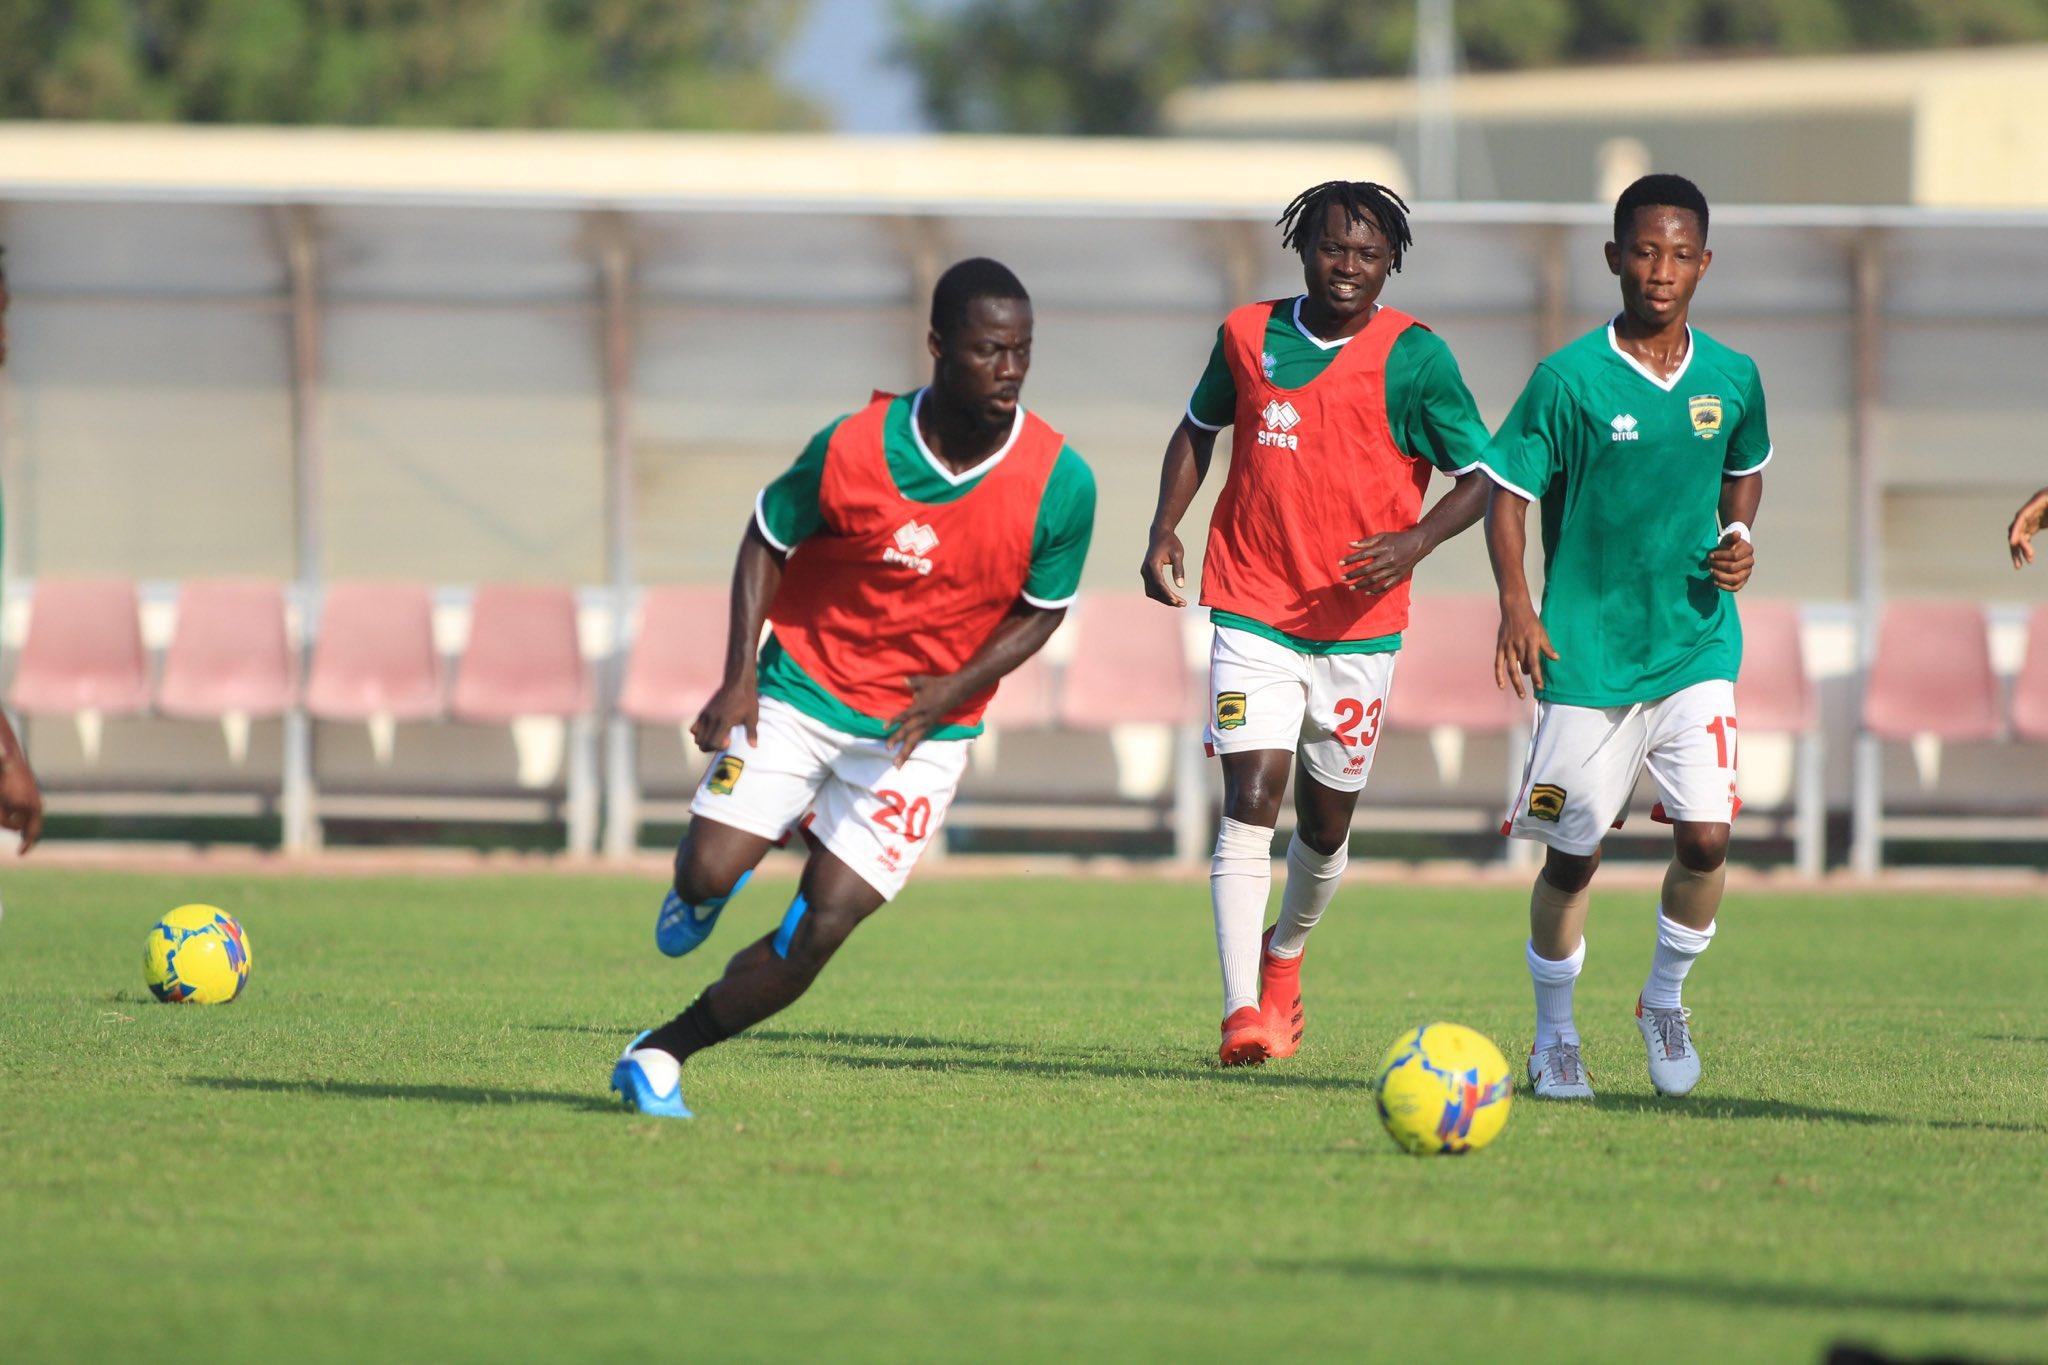 VIDEO: Asante Kotoko suffer defeat to Al Hilal in pre-season friendly